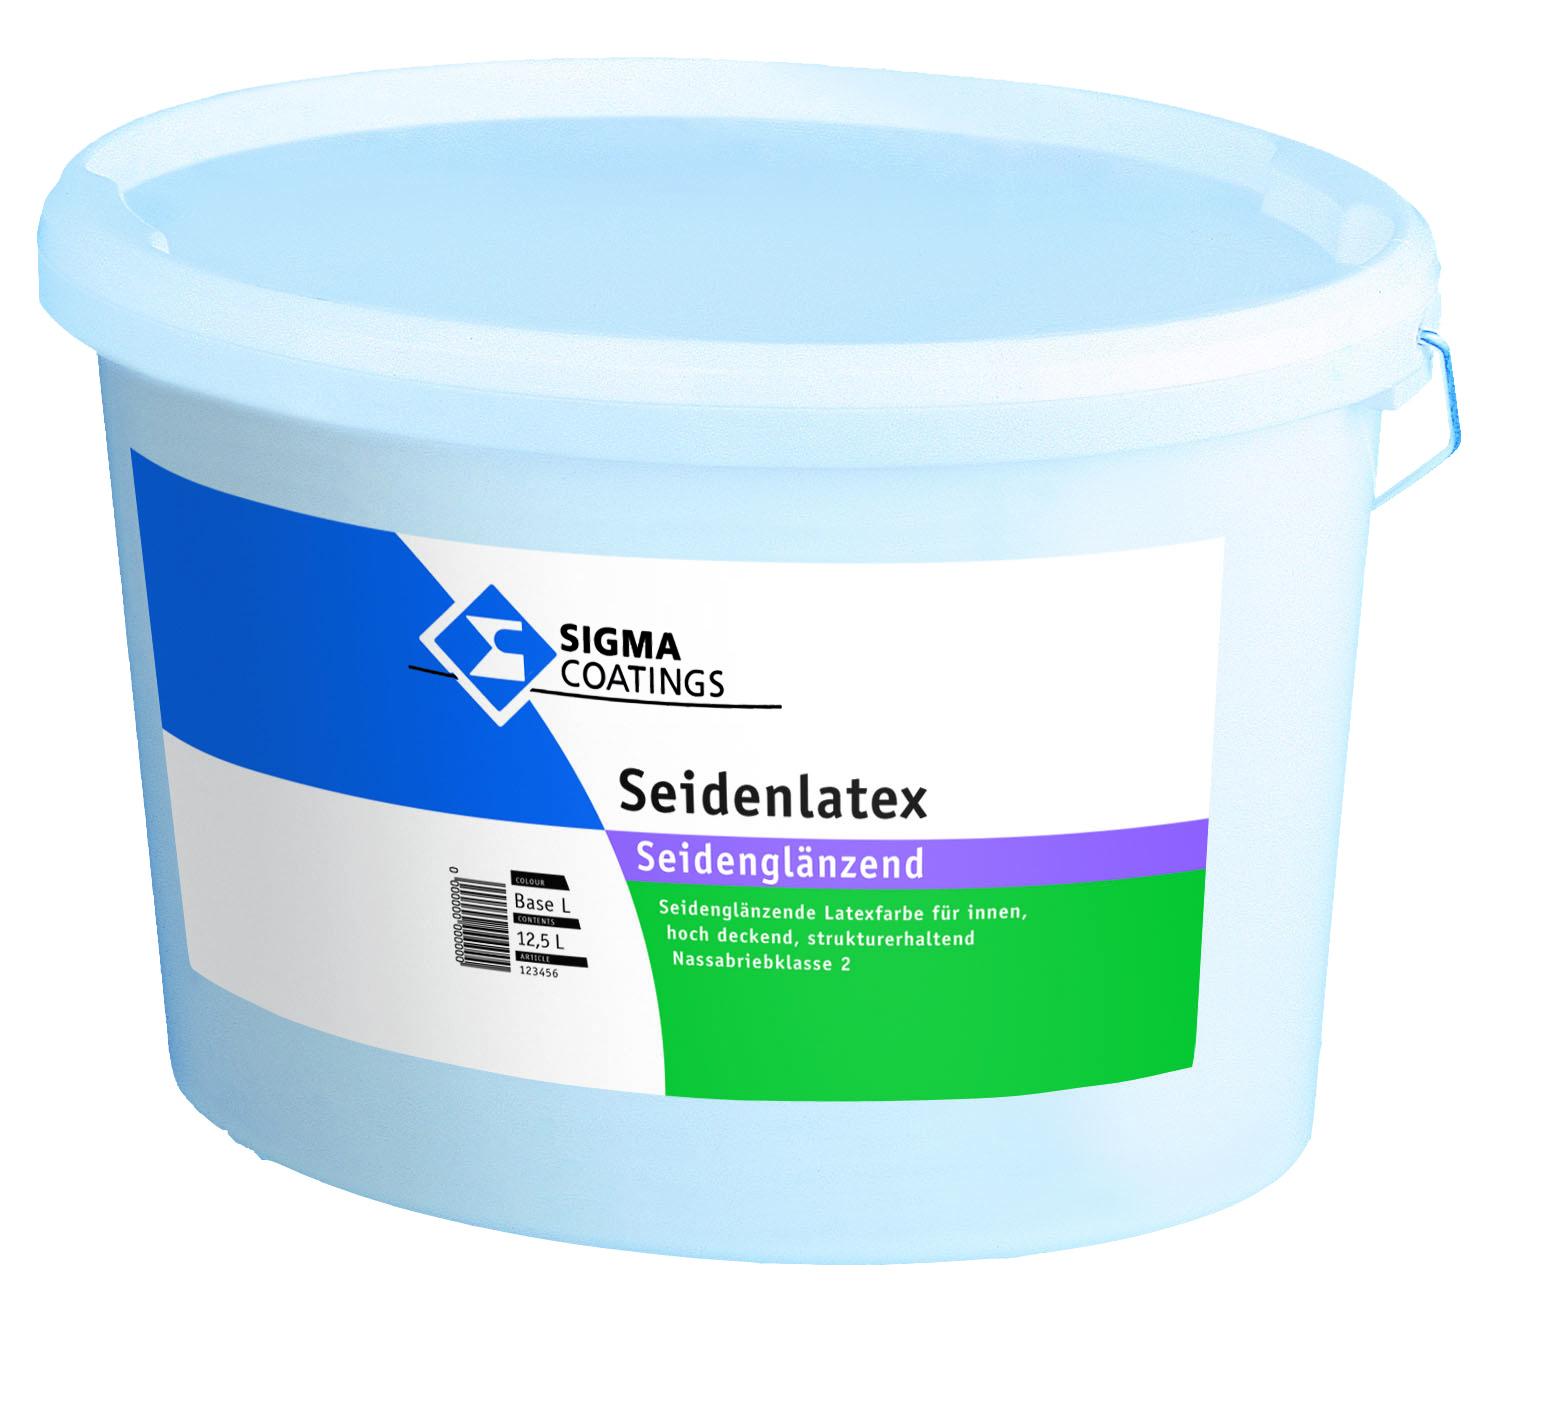 SIGMA Seidenlatex